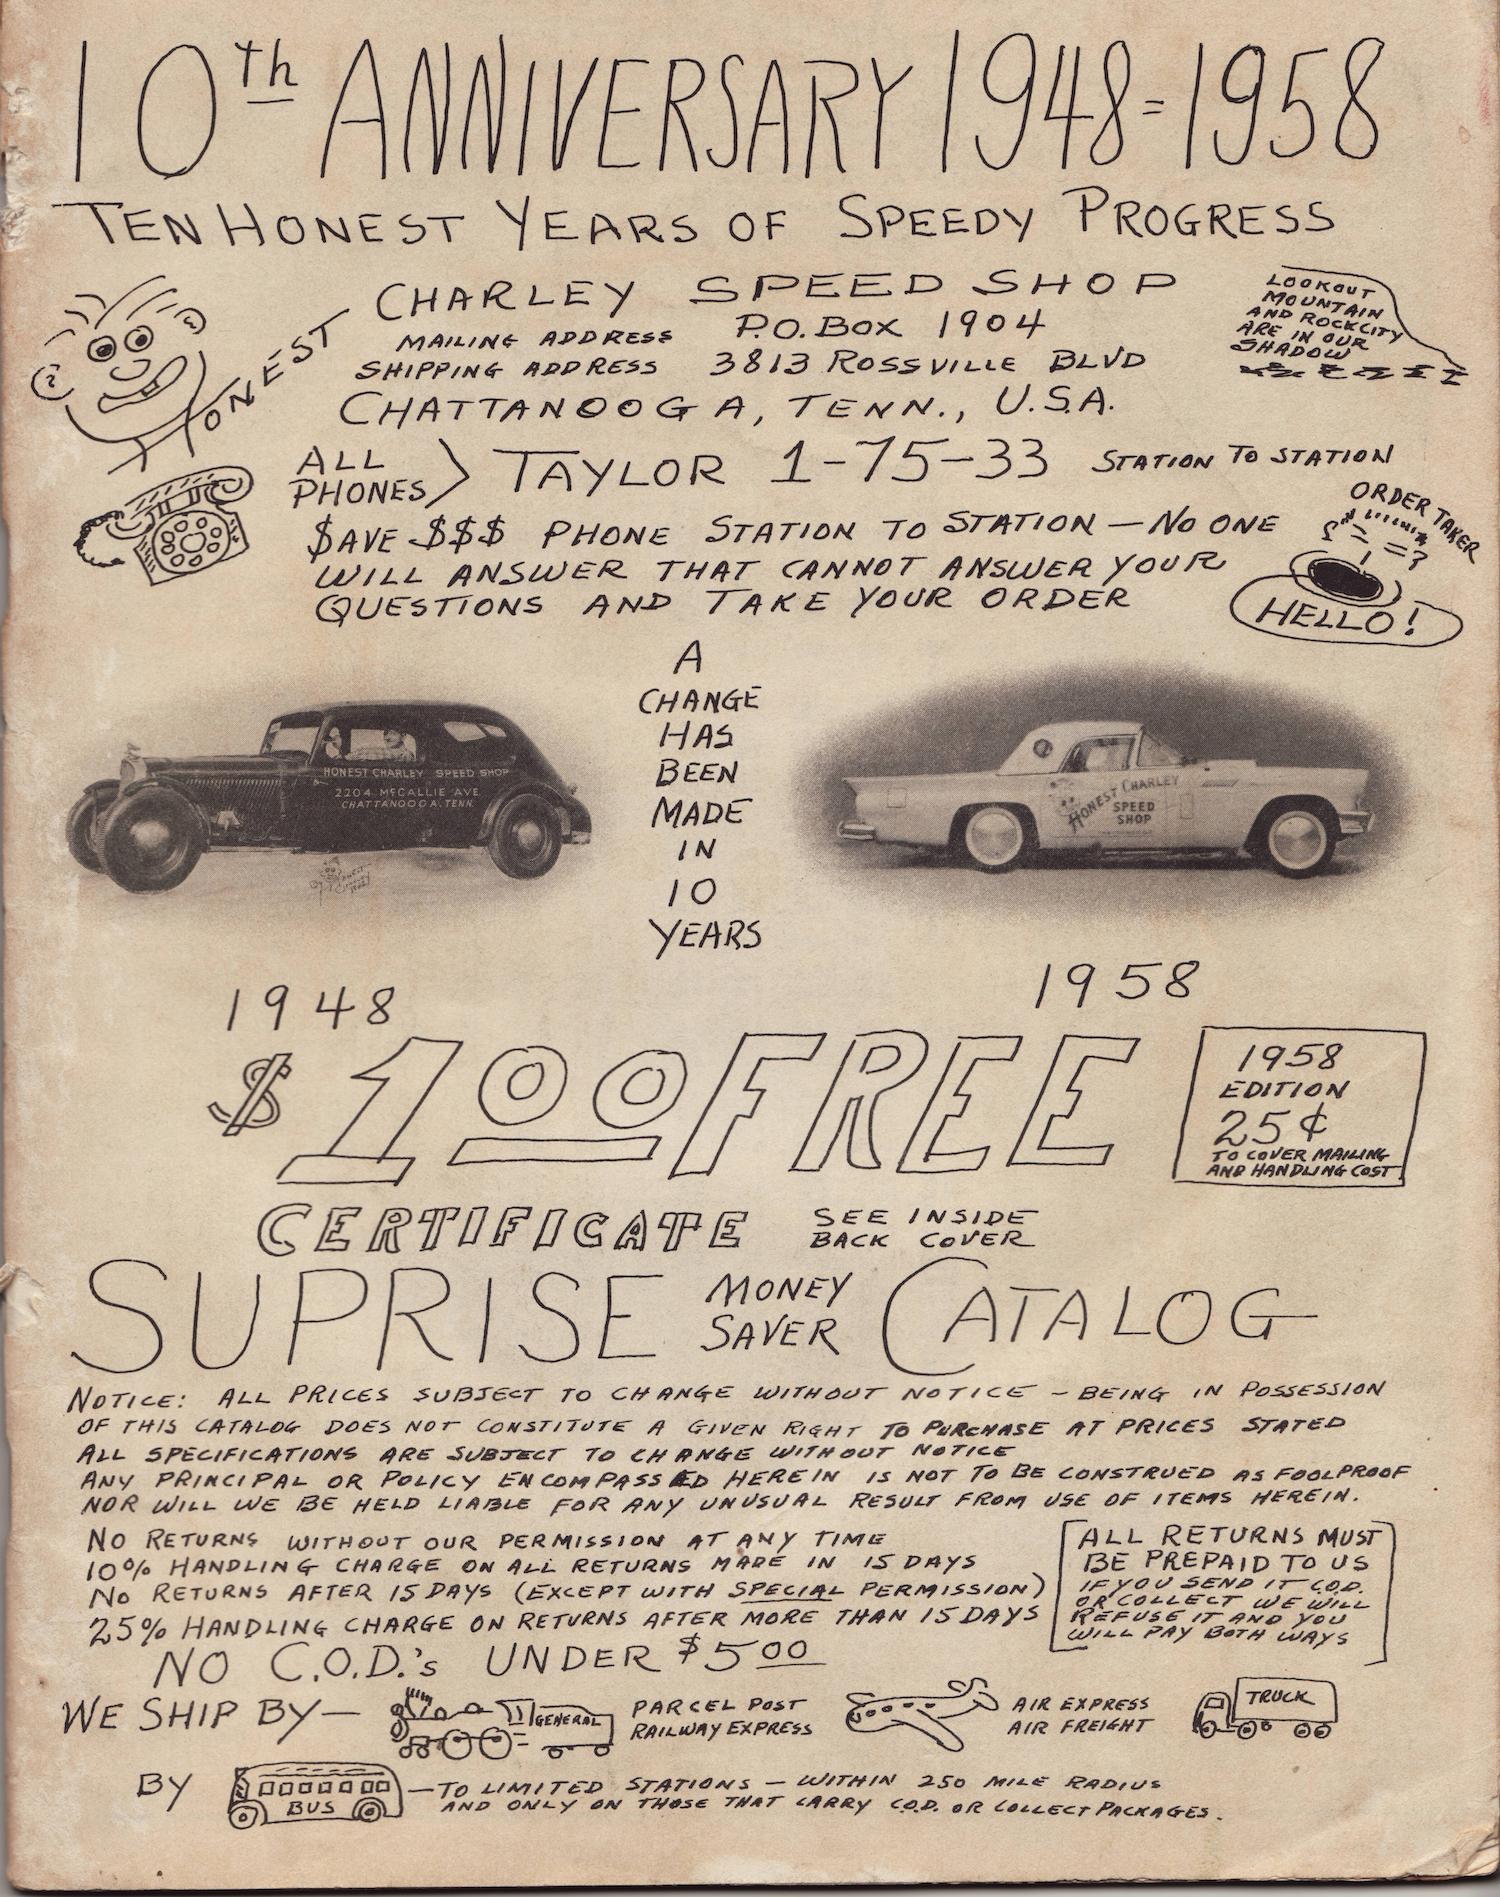 003-HC-Catalog-1958